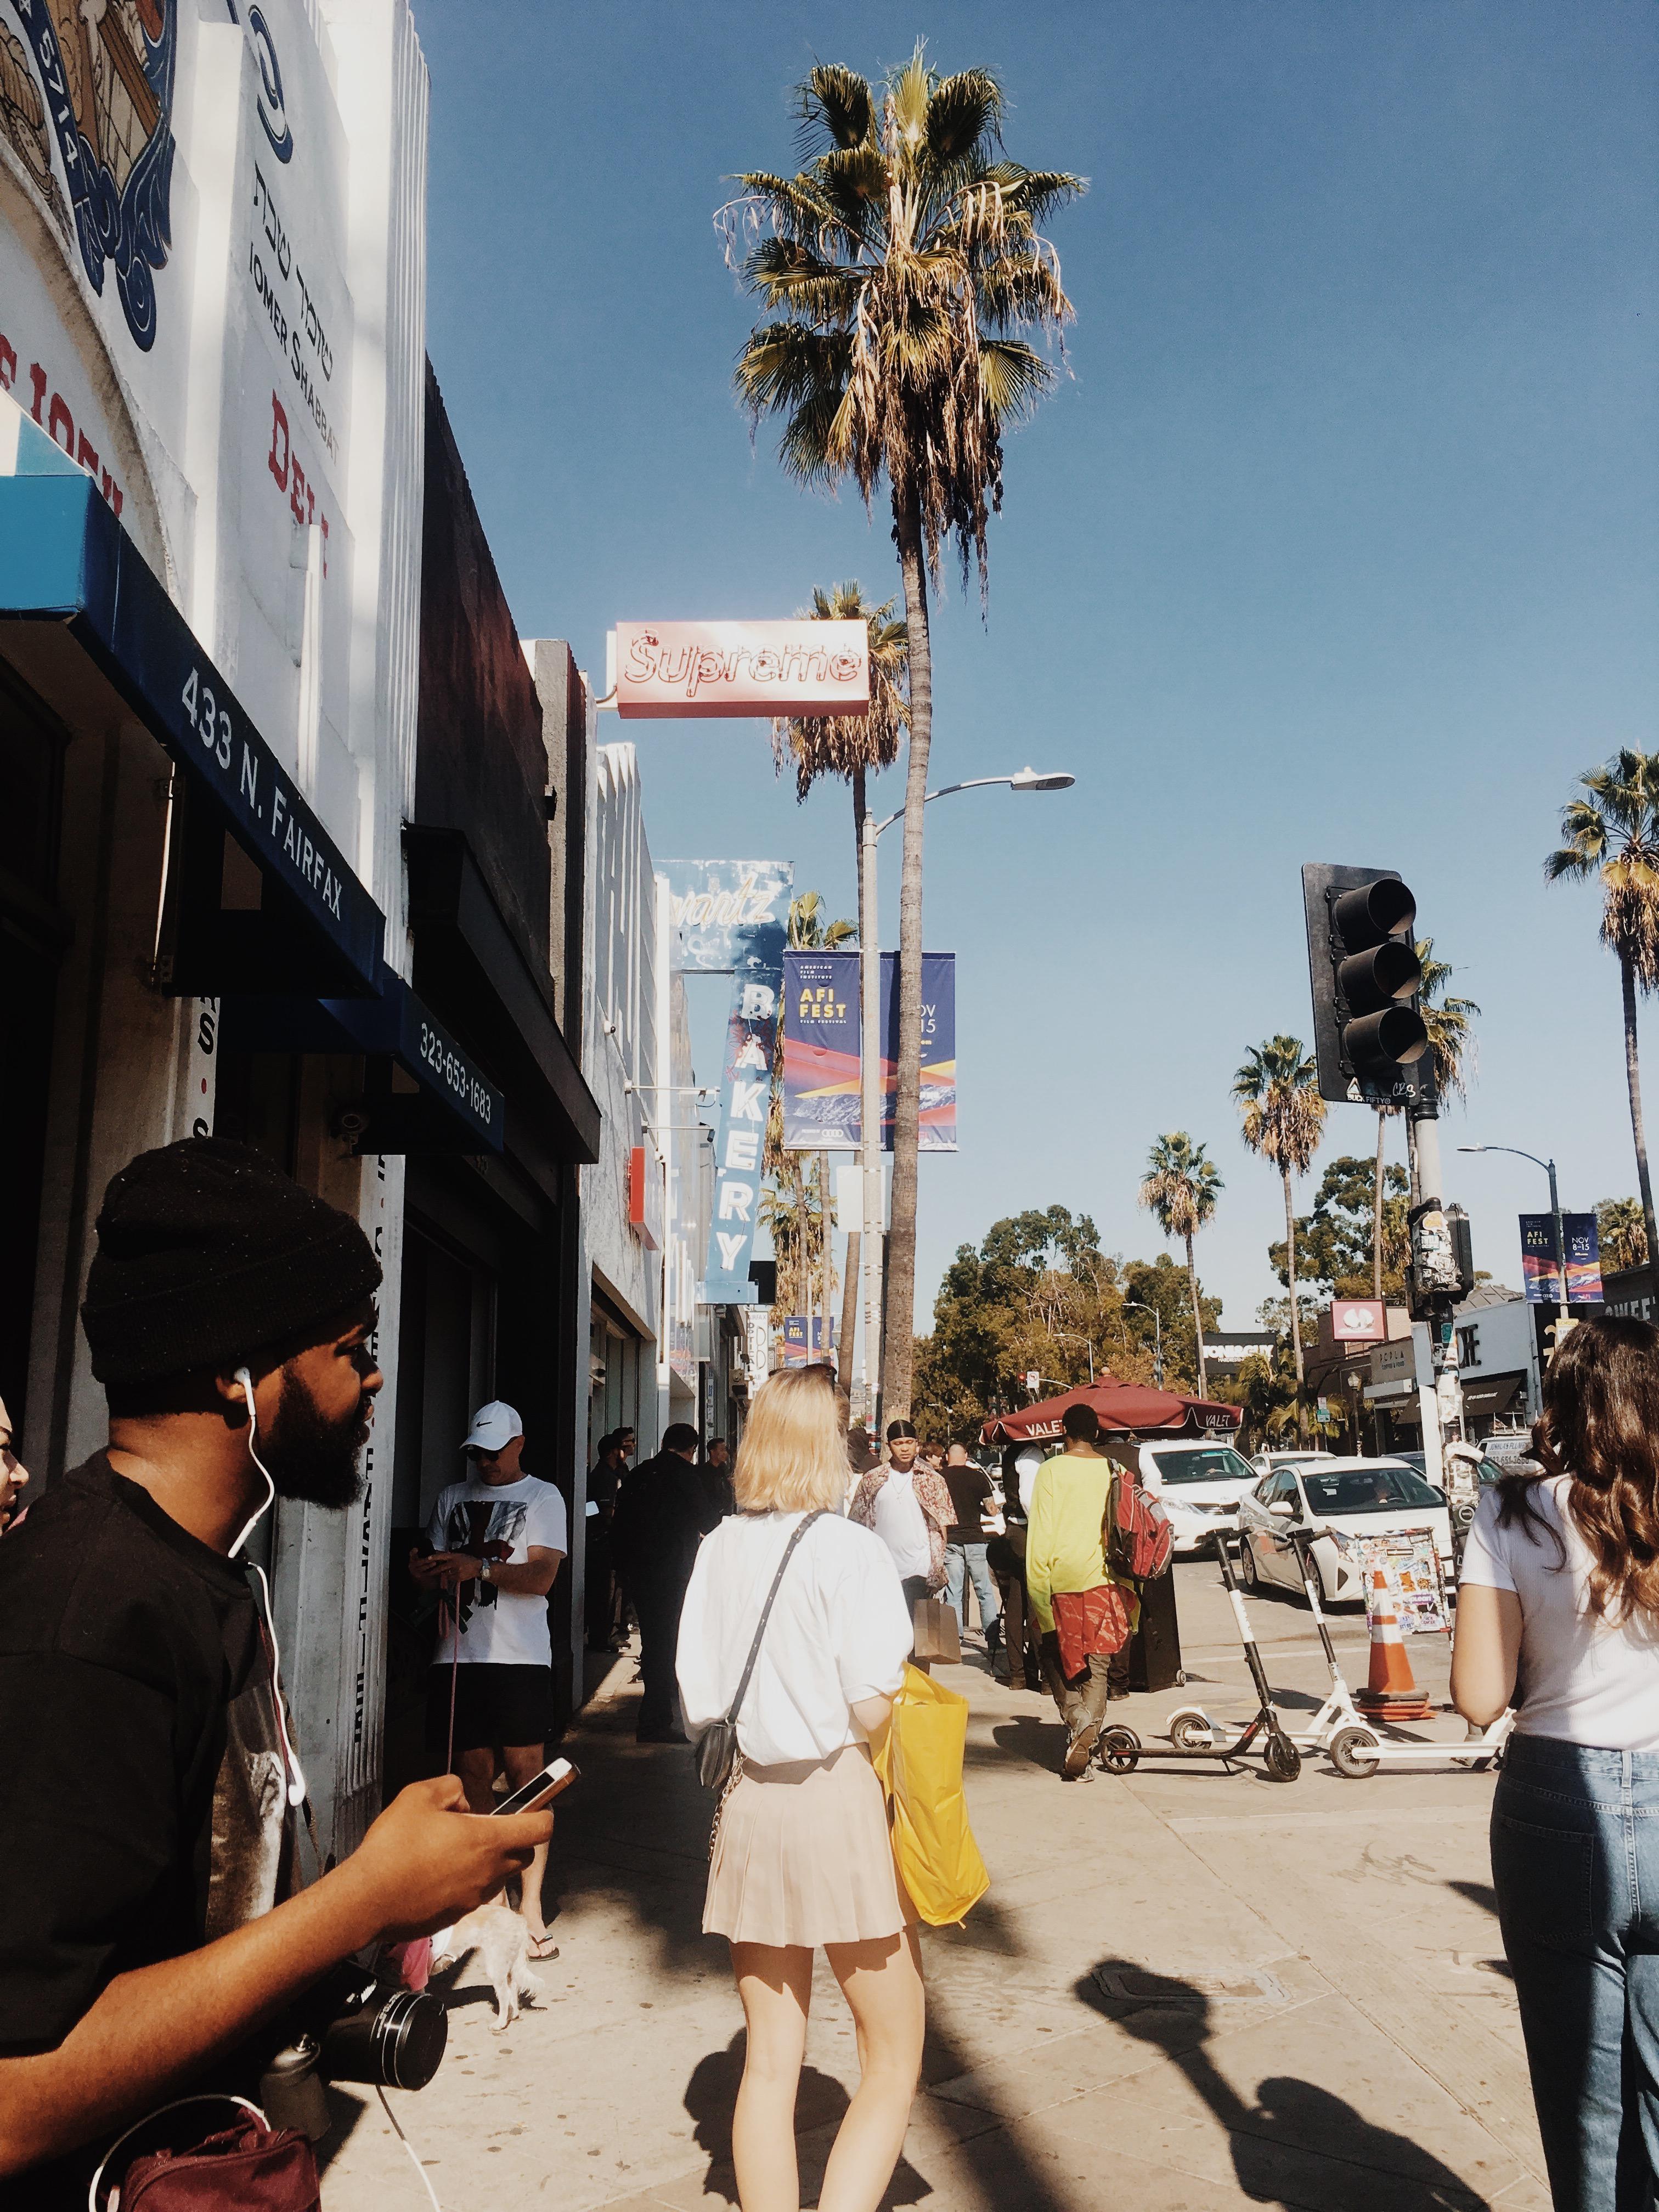 [object object] Converse X : #RatedOneStar Los Angeles Experience A2A21625 B0D7 4187 983D C4700E752FE0  HYPE WORLD VIEWS The Los Angeles One Star Experience Presented By Converse X A2A21625 B0D7 4187 983D C4700E752FE0